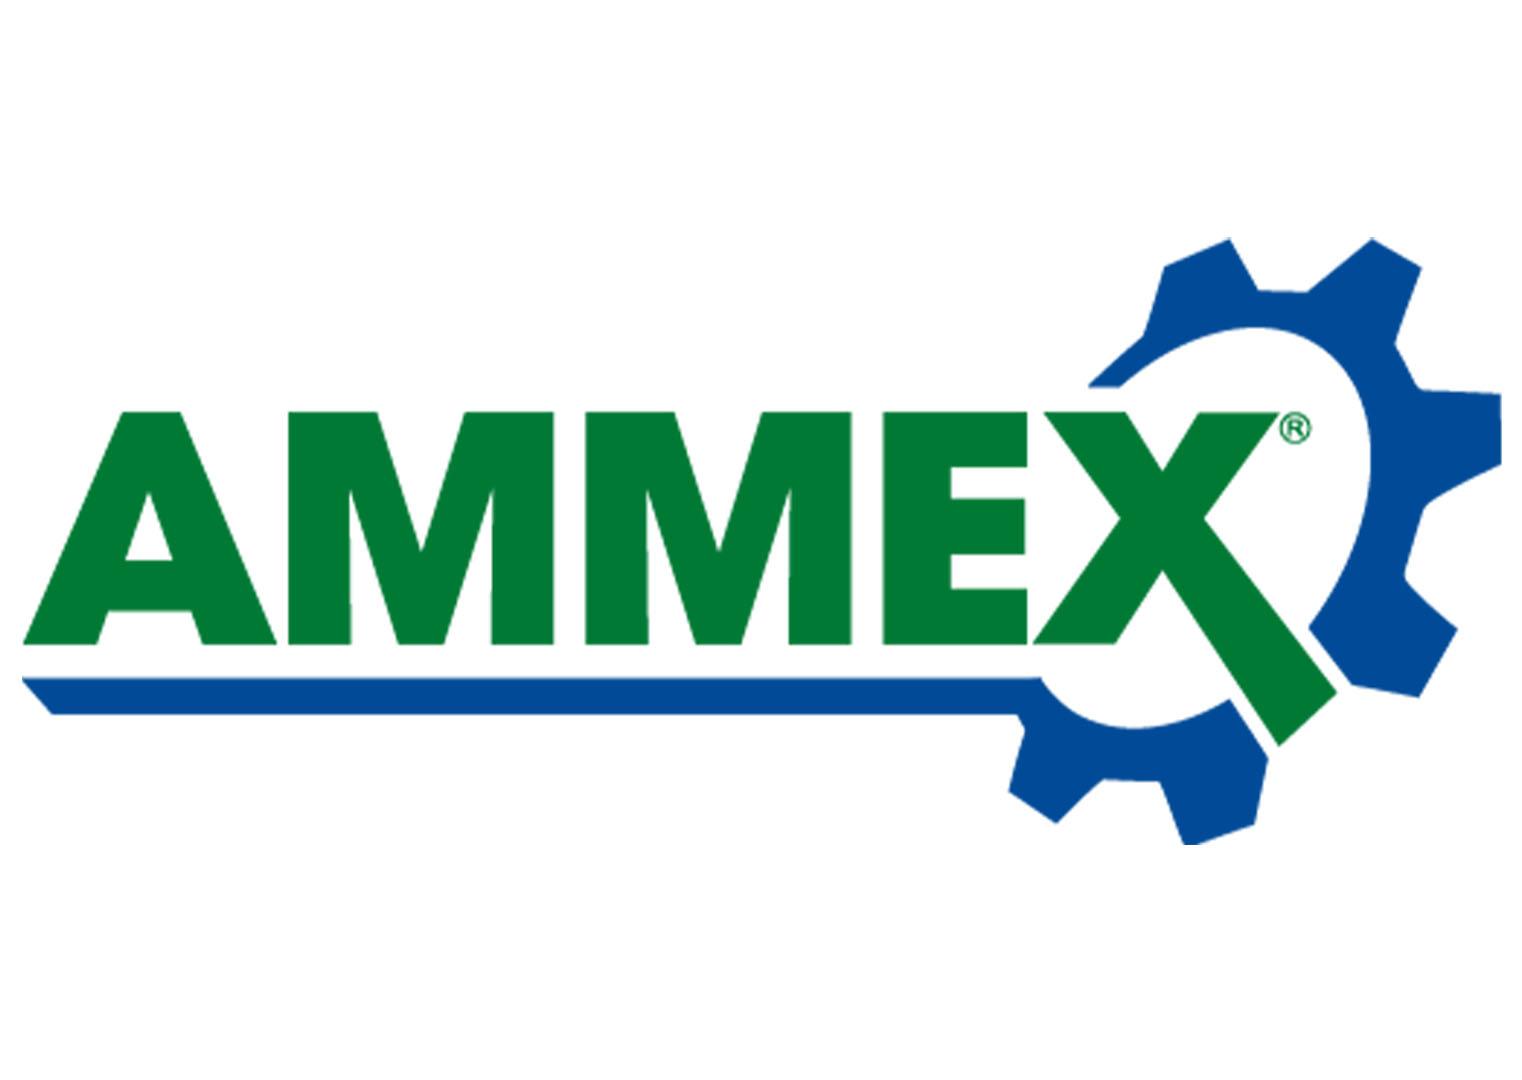 Ammex®